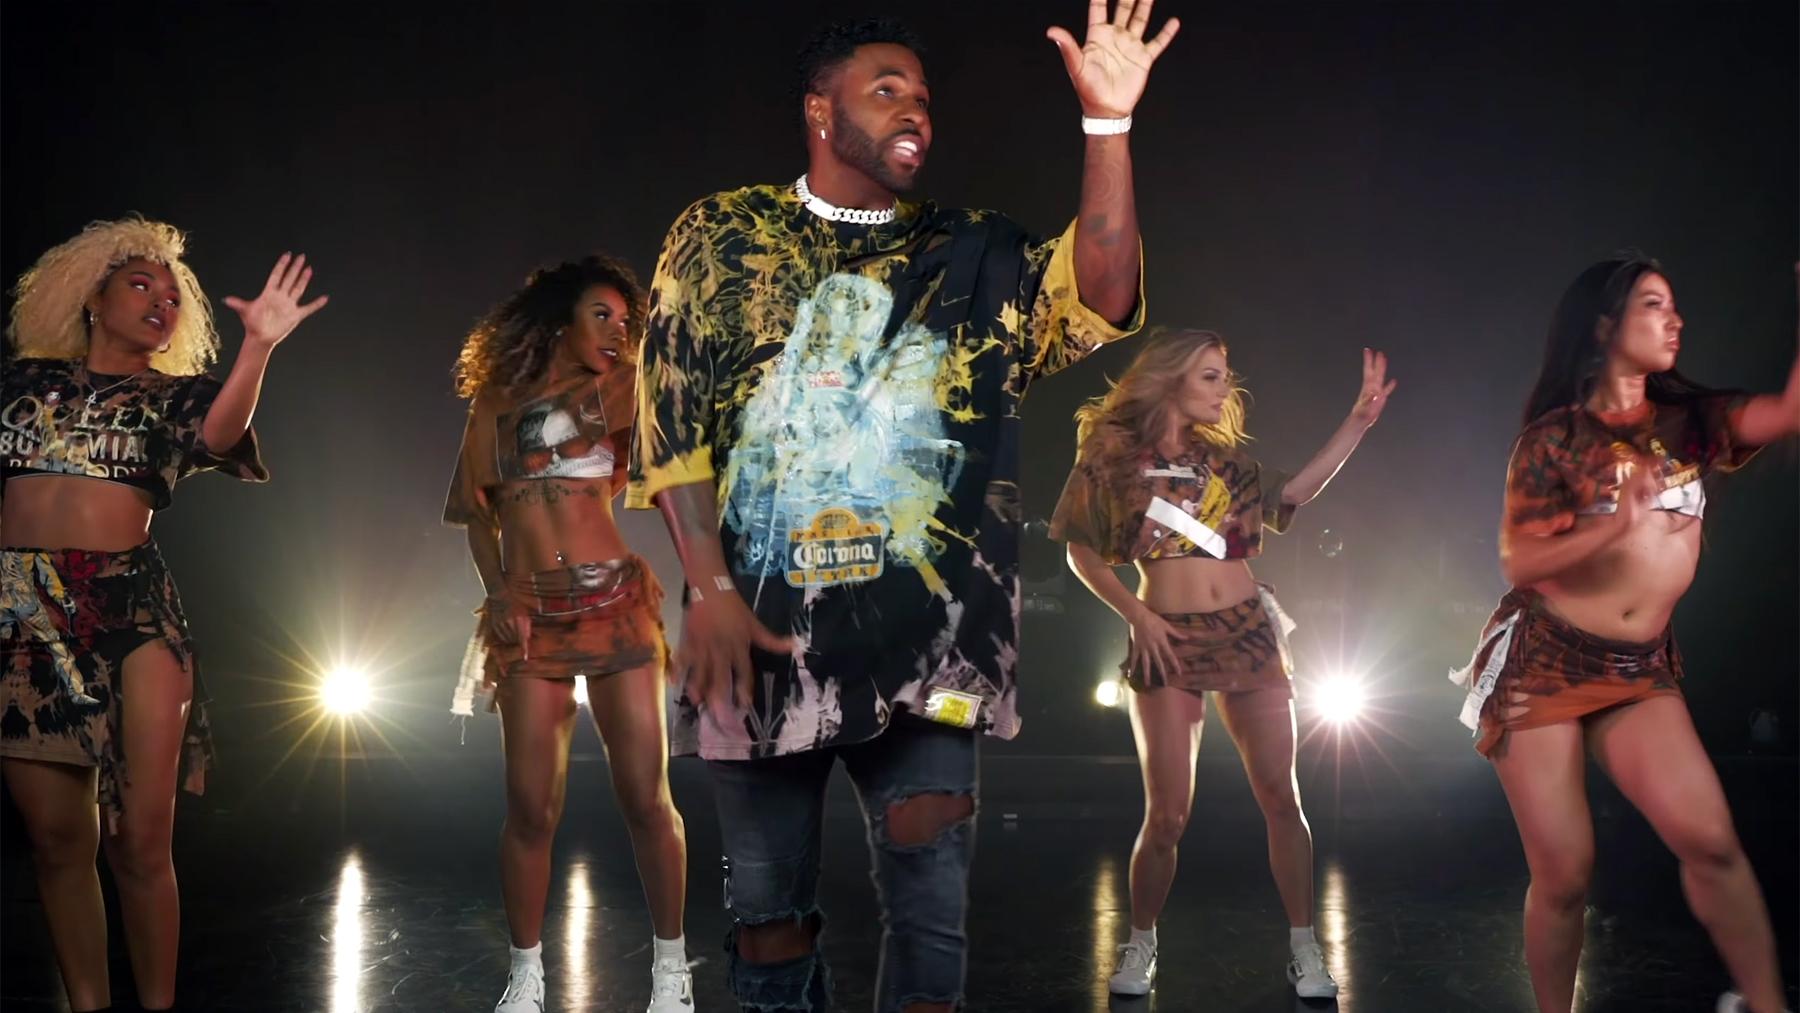 Jason Derulo Wants to 'Take You Dancing' With Future TikTok Smash - Rolling  Stone